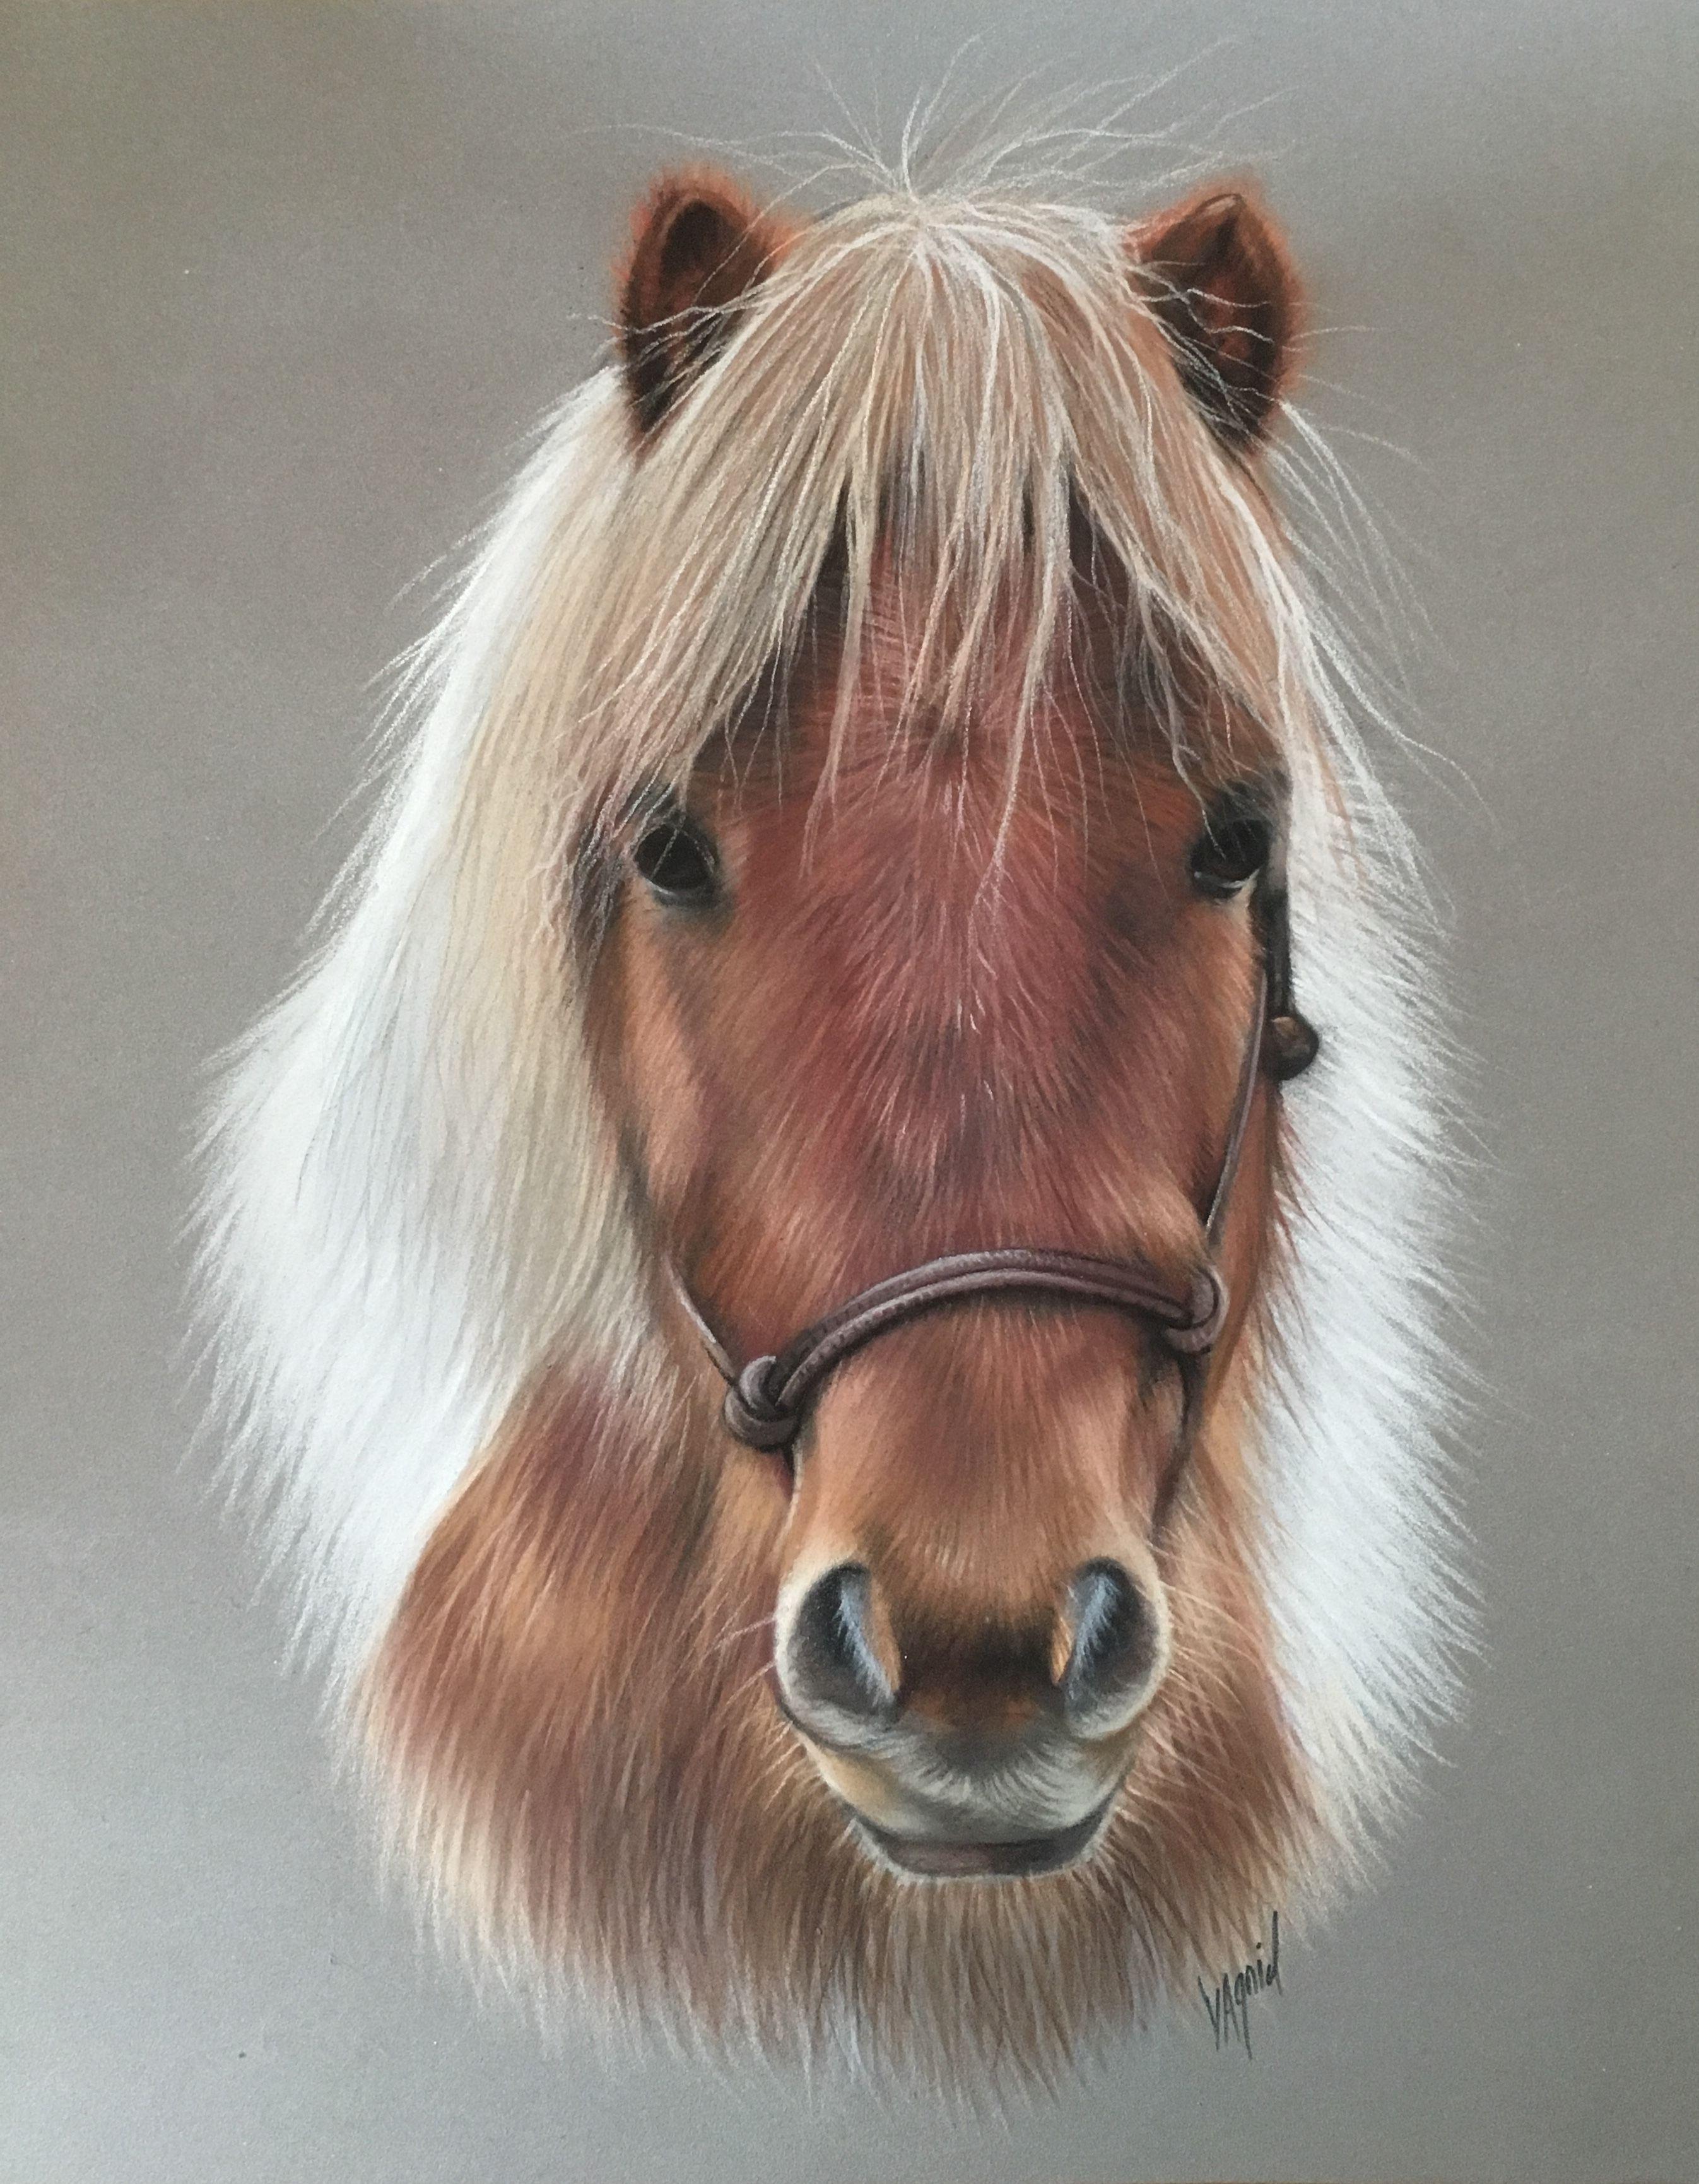 Poney Pastel Dessin De Poney Realise Au Pastel Poney Littlehorse Horse Horselove Animalpainting Animalartist Dessin Poney Dessin Cheval Peinture Cheval